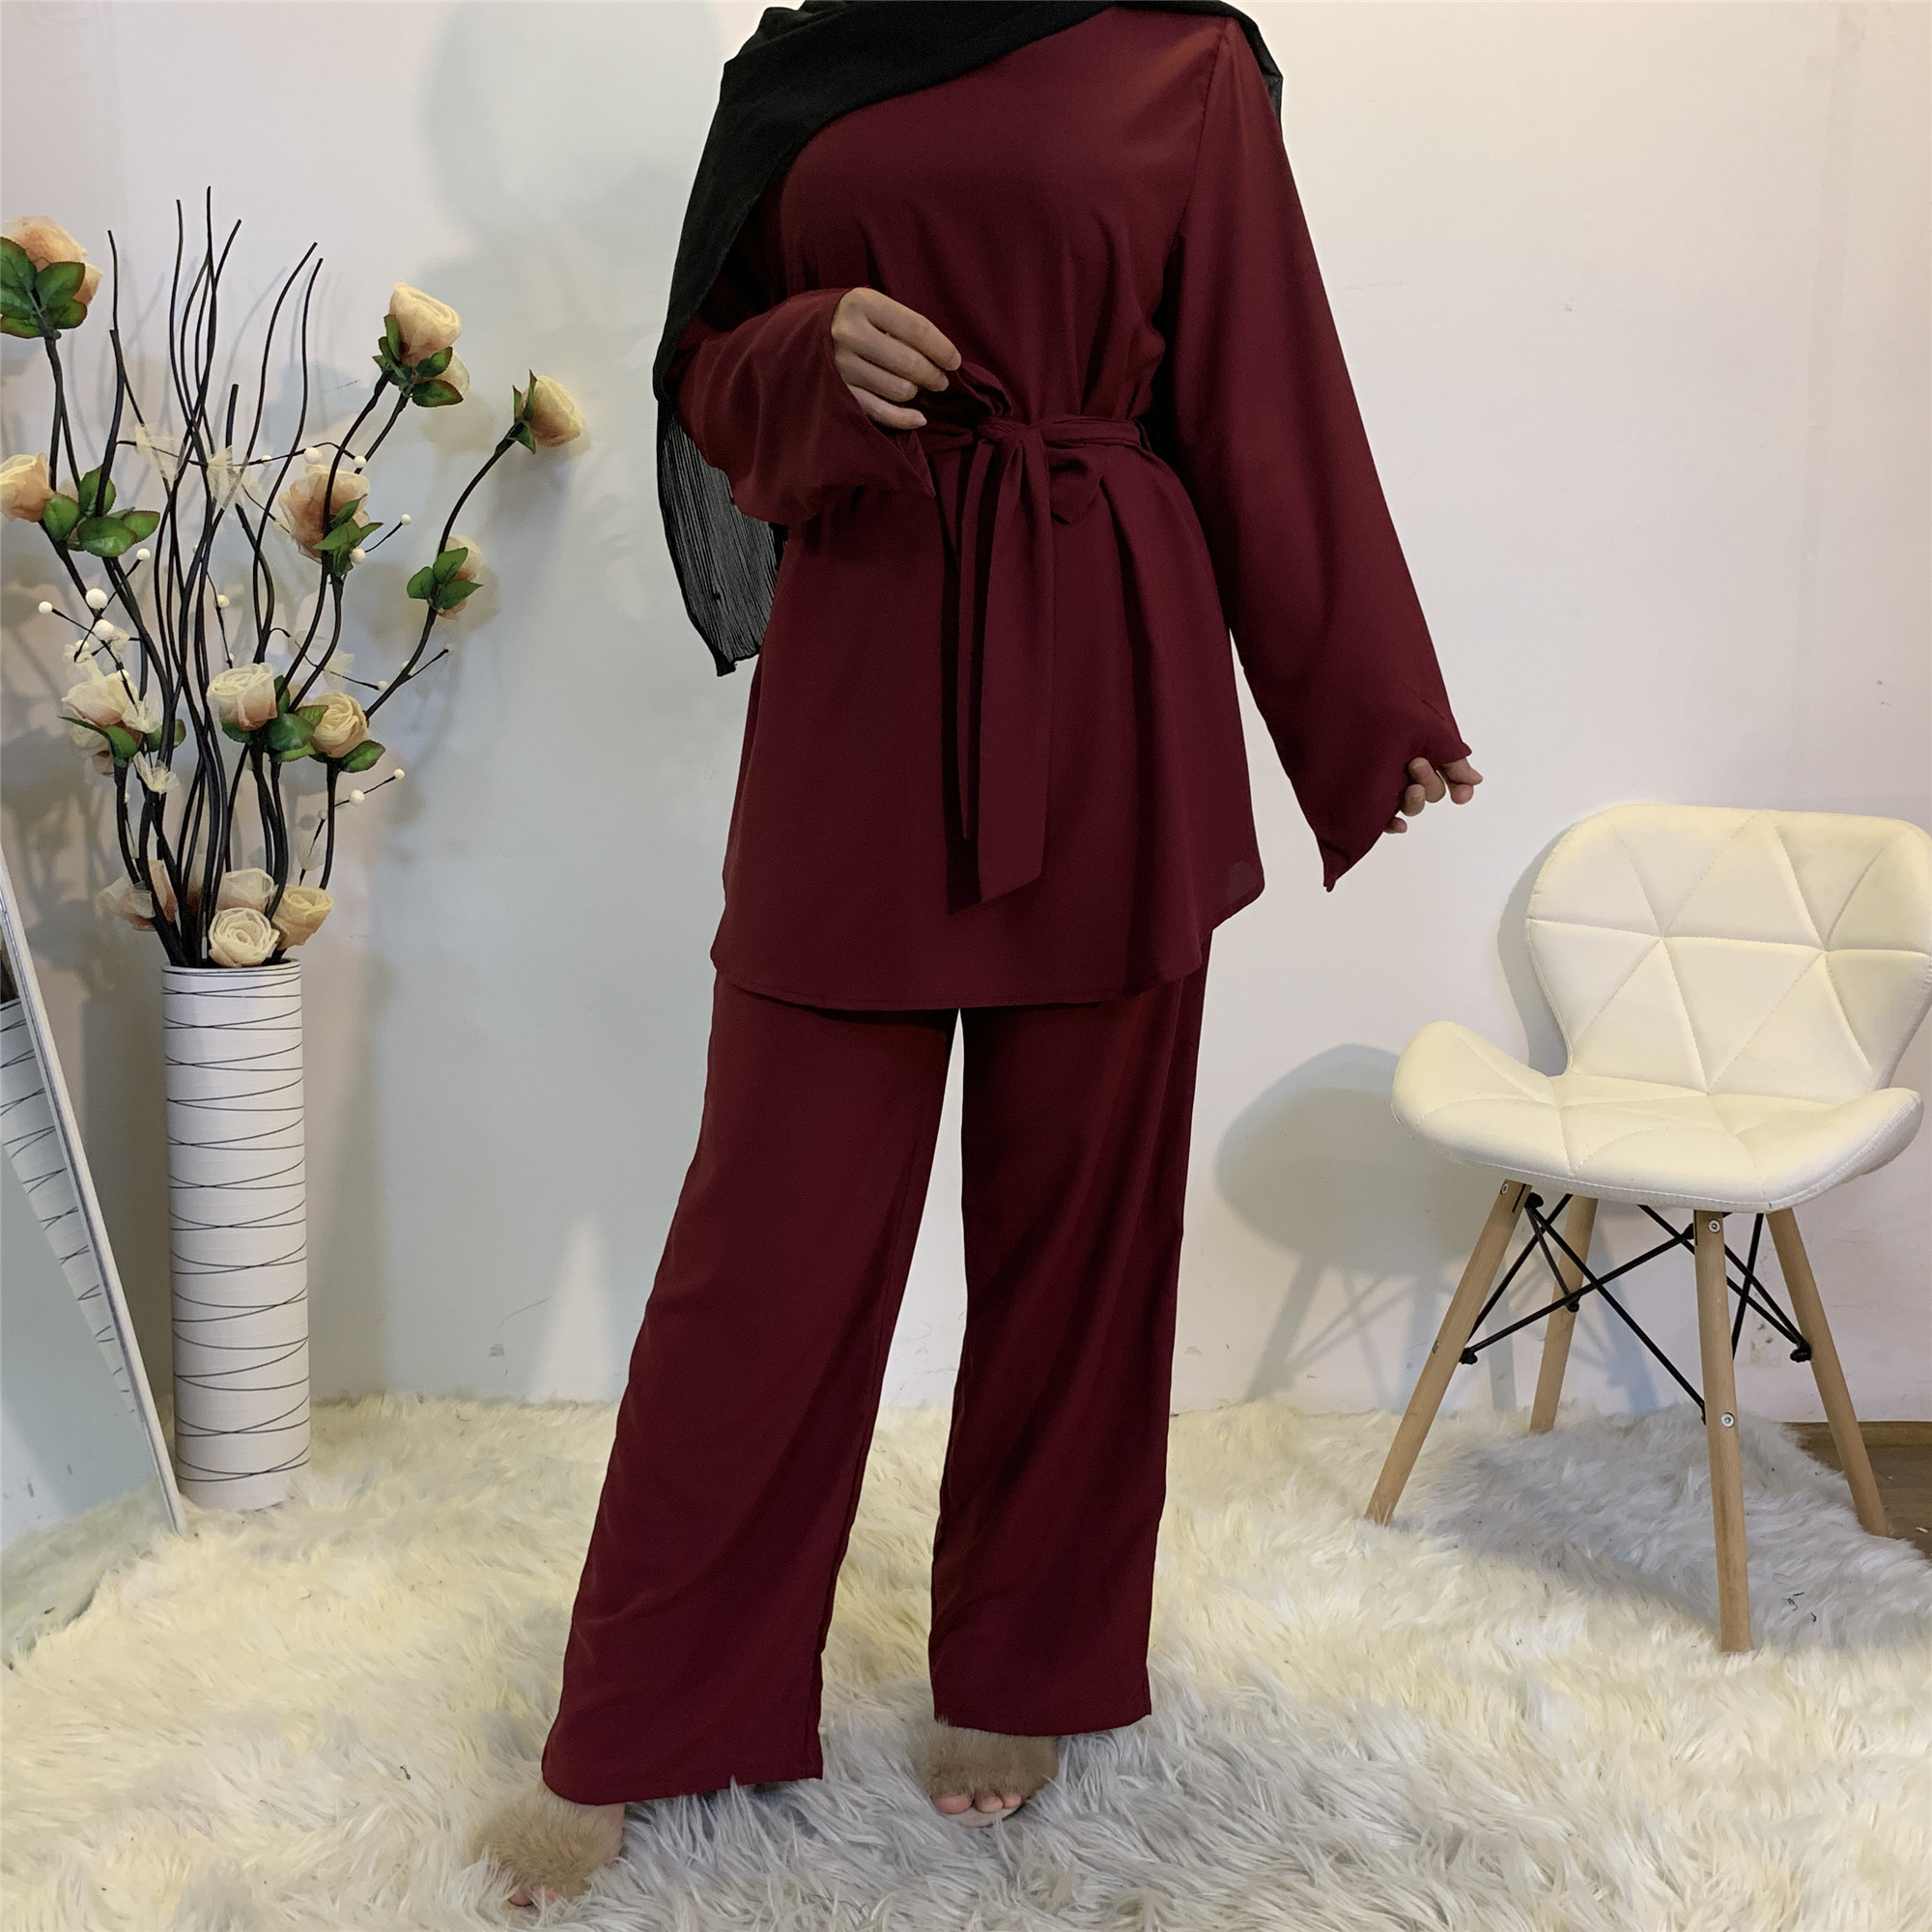 2 Piece Set Women Muslim Sets Hijab Dress Turkish Top and Pants Islamic Clothing Abaya Dubai Suit Eid Mubarak Musulman Ensembles